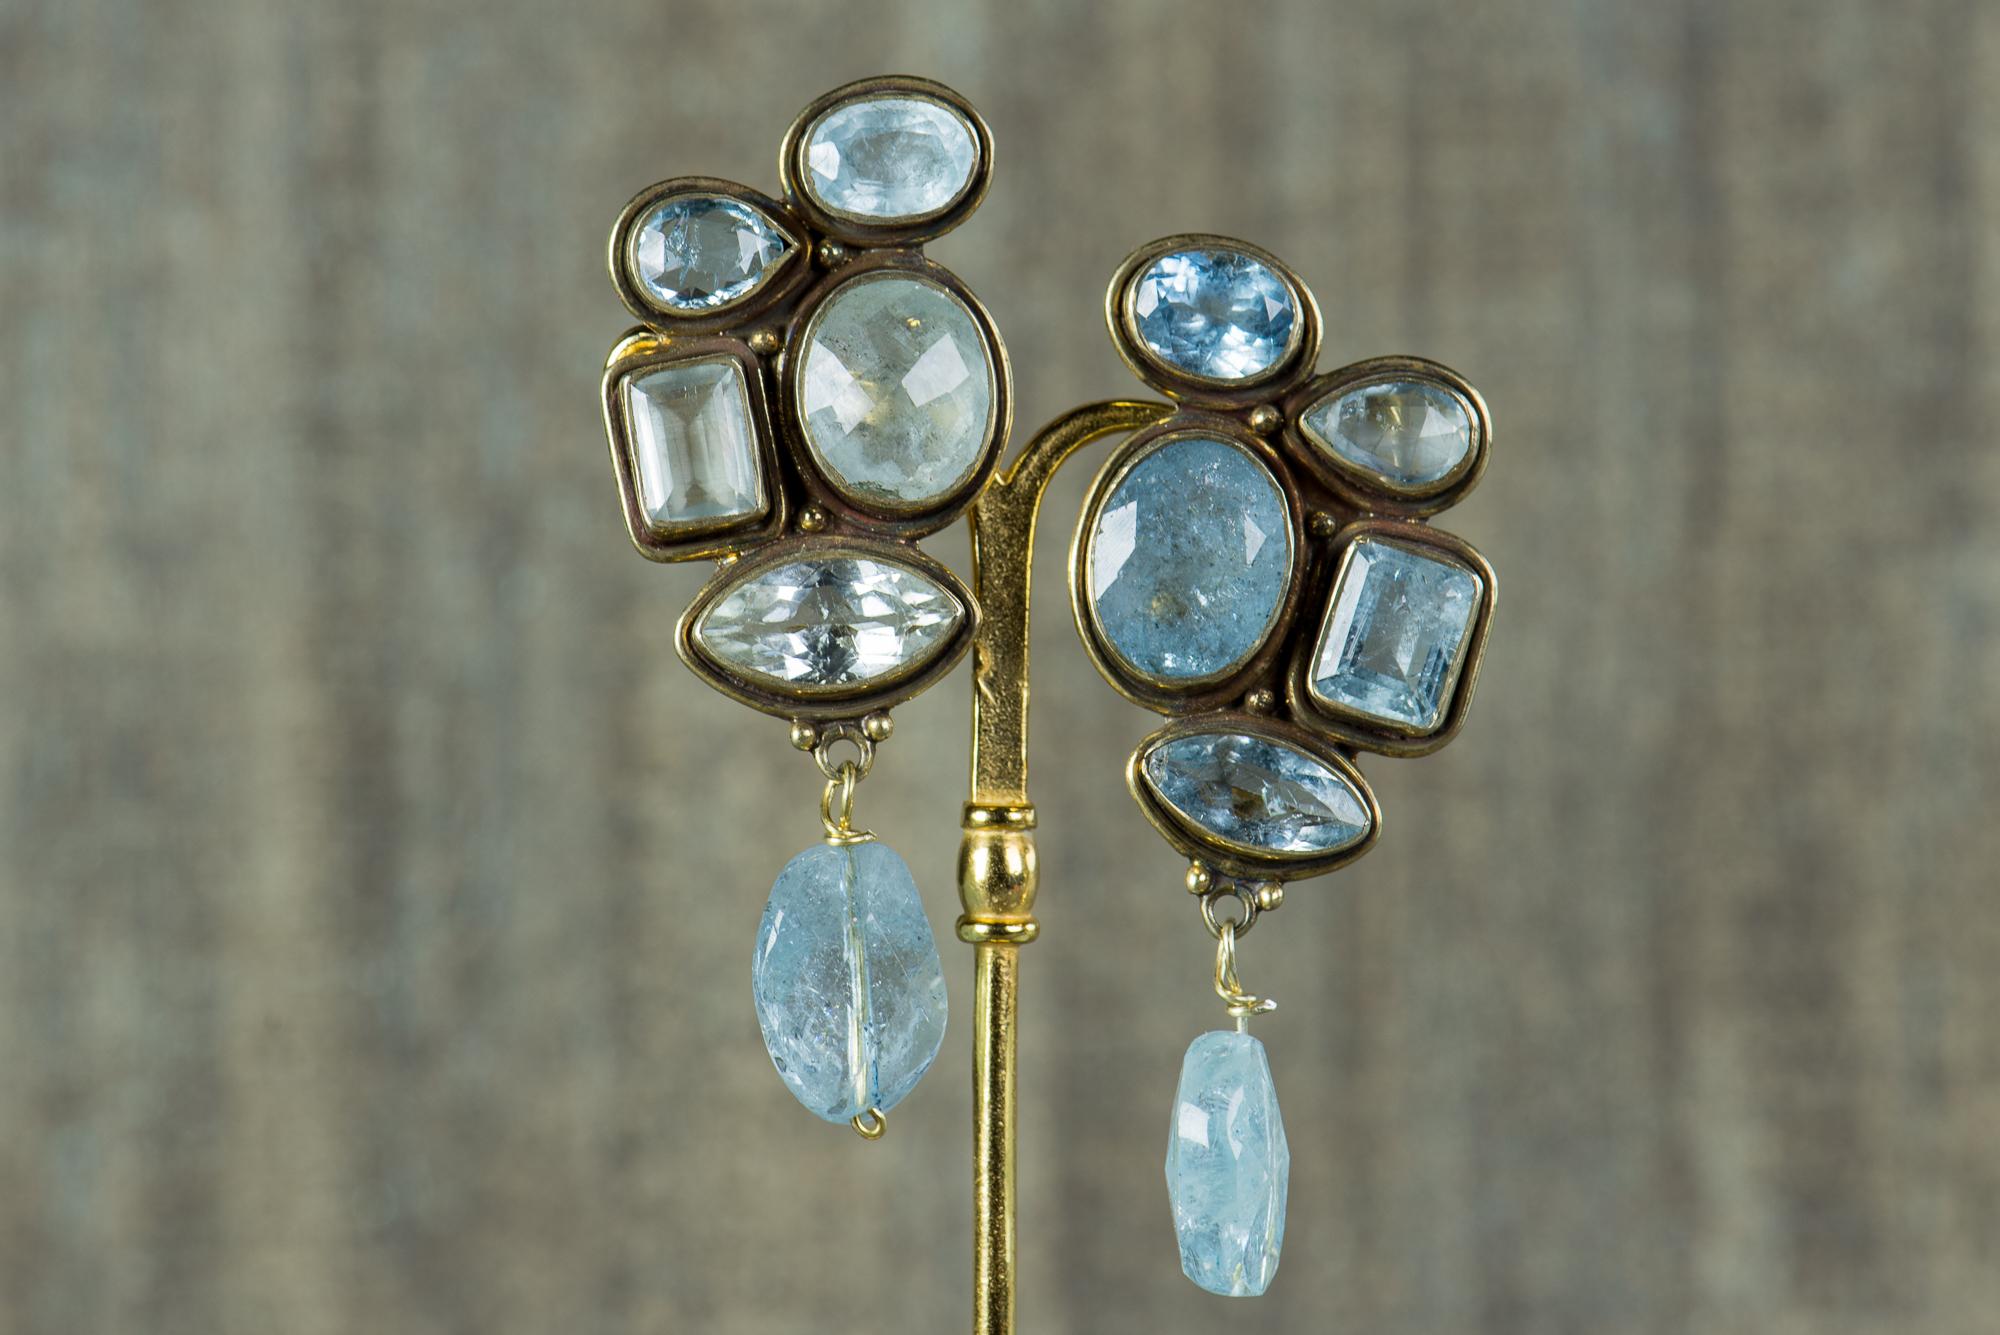 Pendientes eli clip l pez linares for Lin s jewelry agana guam